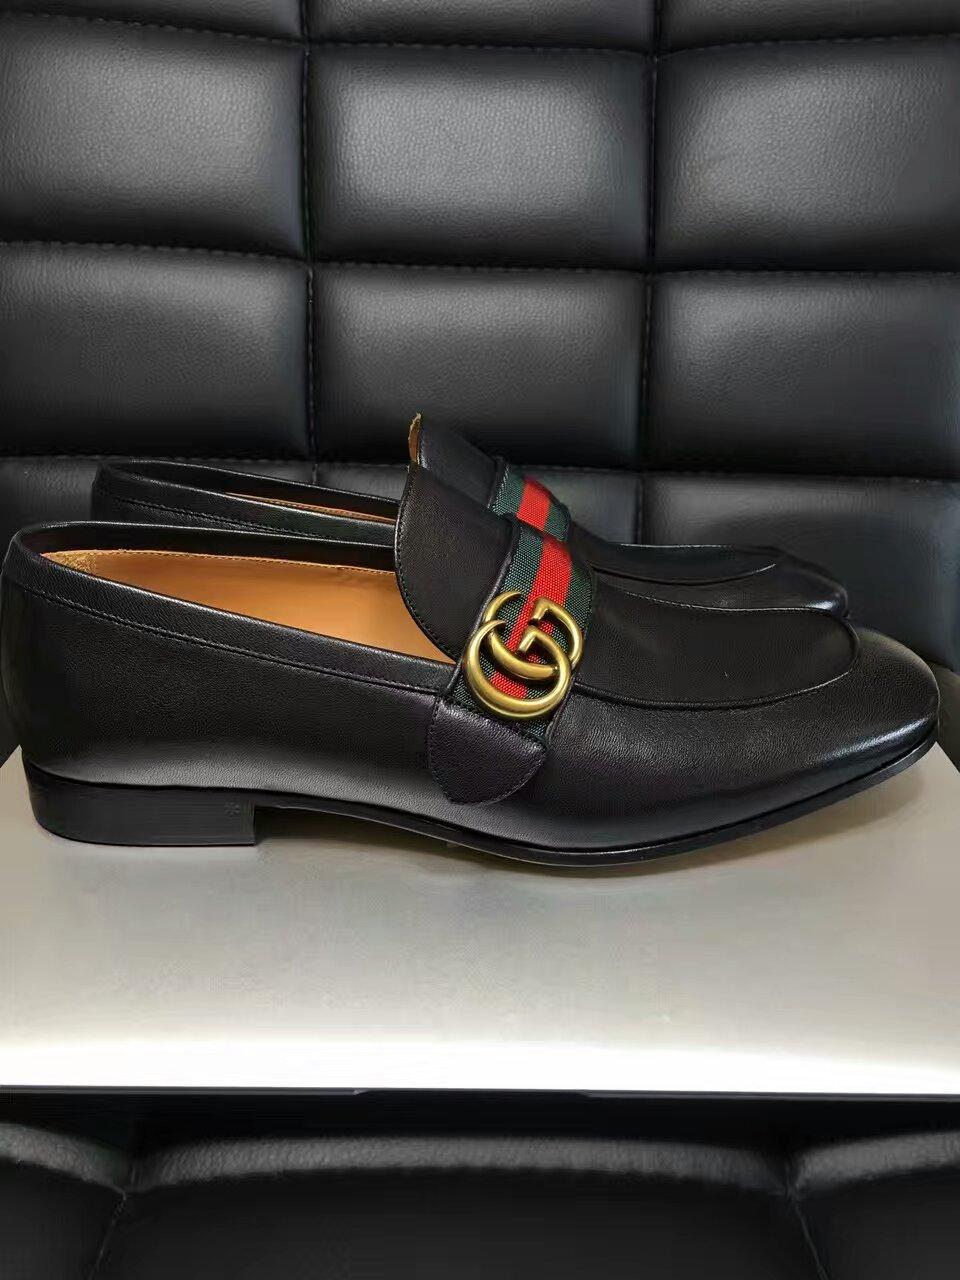 GUCCI最新秀款固特异手工皮鞋